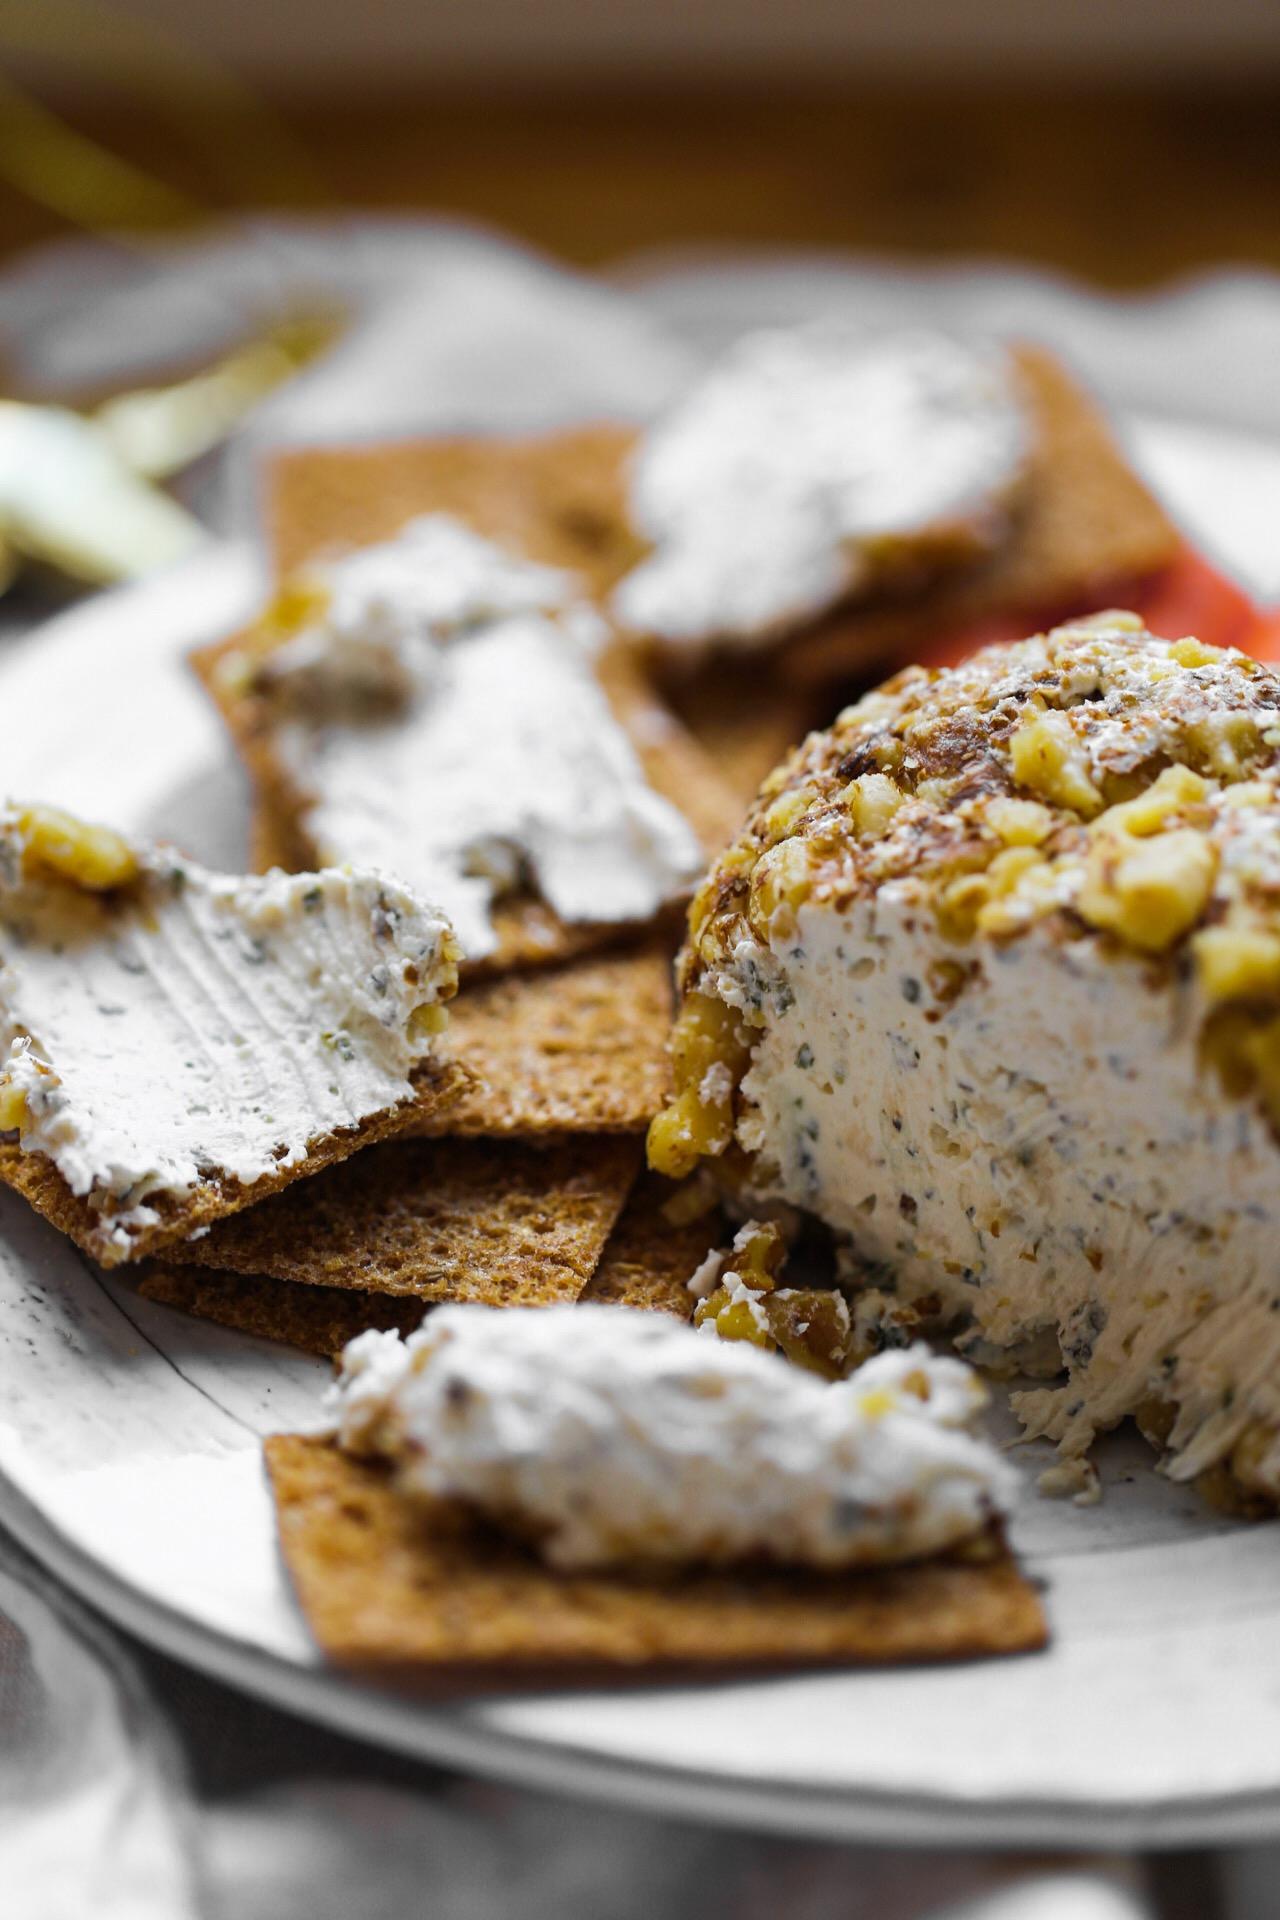 garlic herb cheese ball